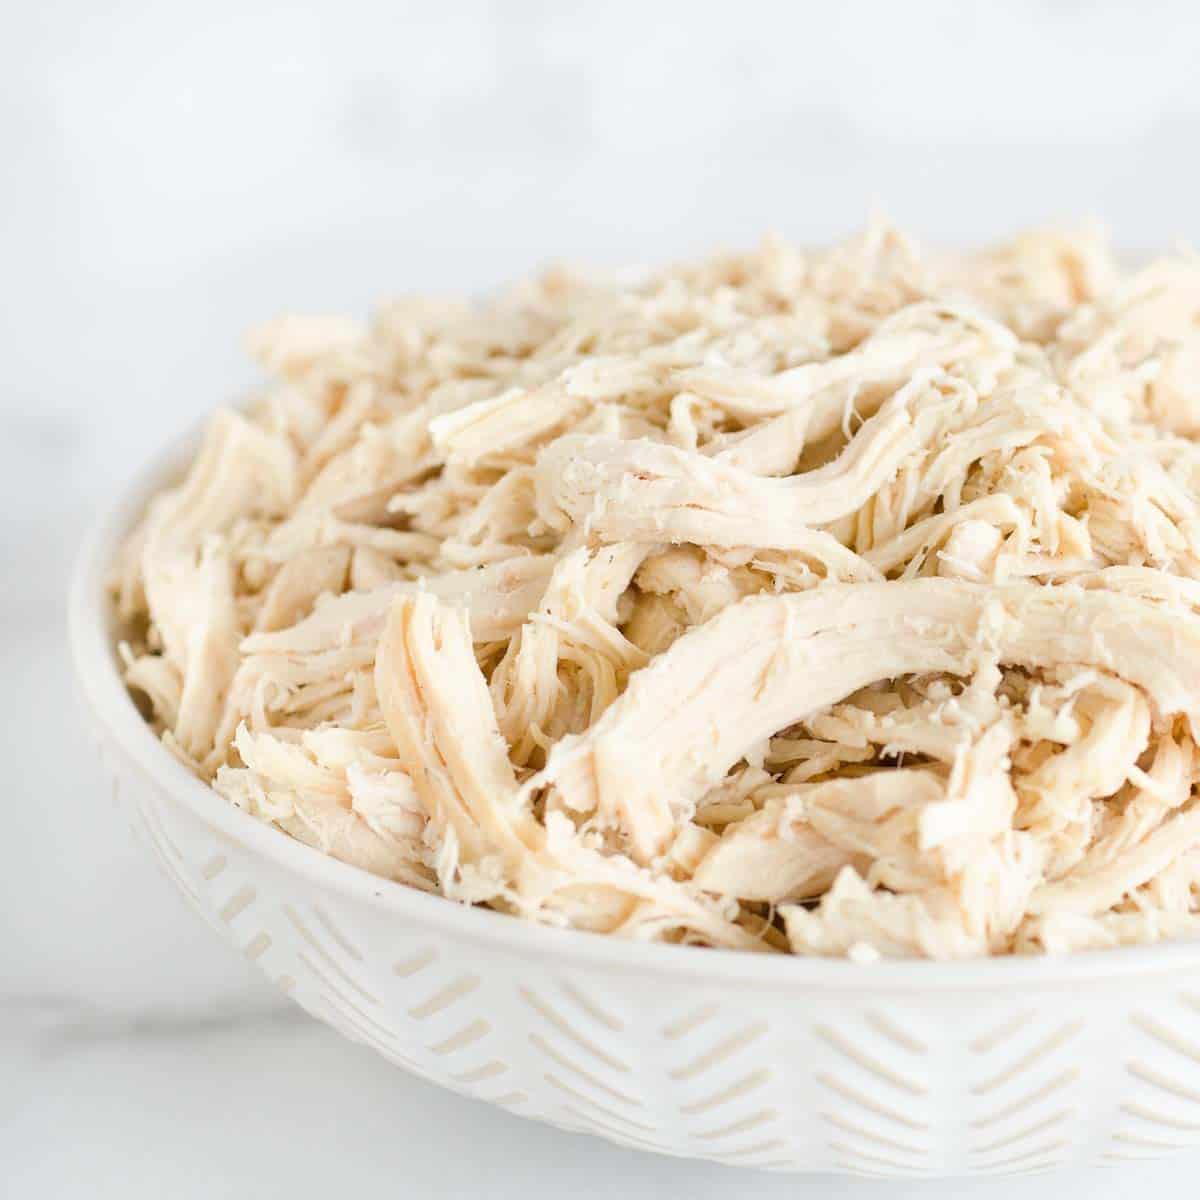 leftover shredded chicken in a bowl